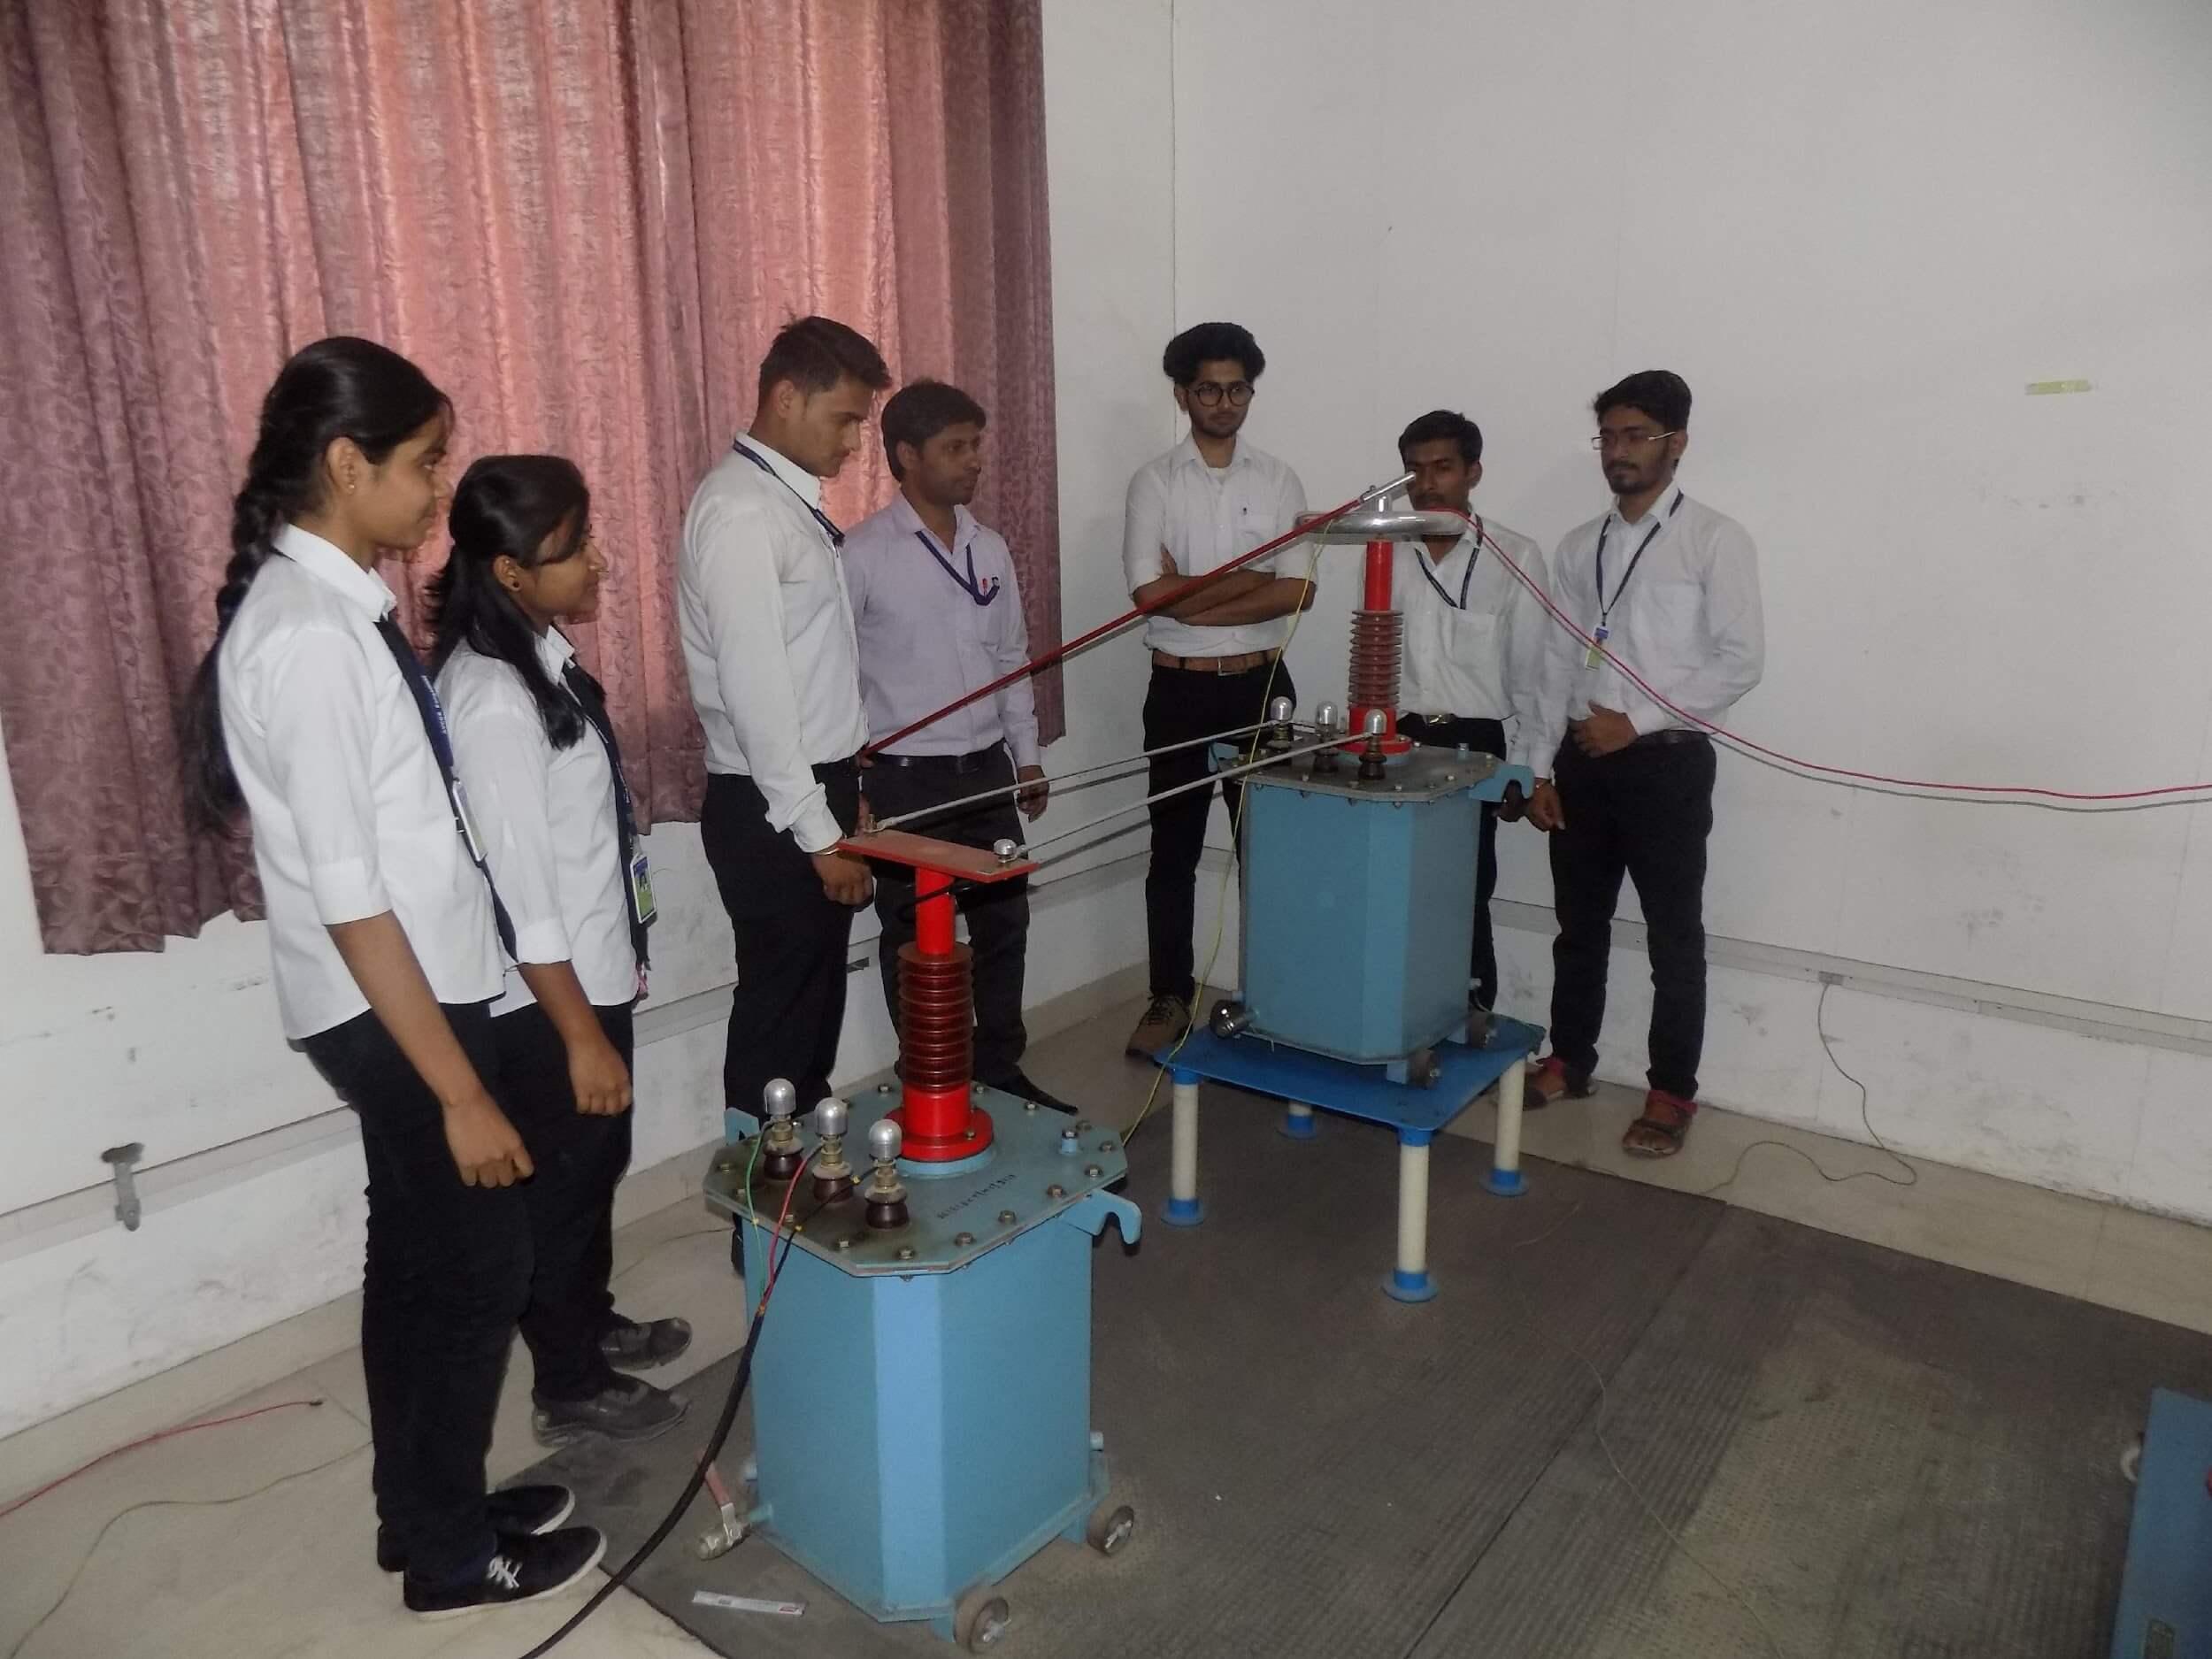 Amrutvahini College Of Engineering Sangamner Dc Motor Drives Electrical Study App By Saru Tech Machines Lab